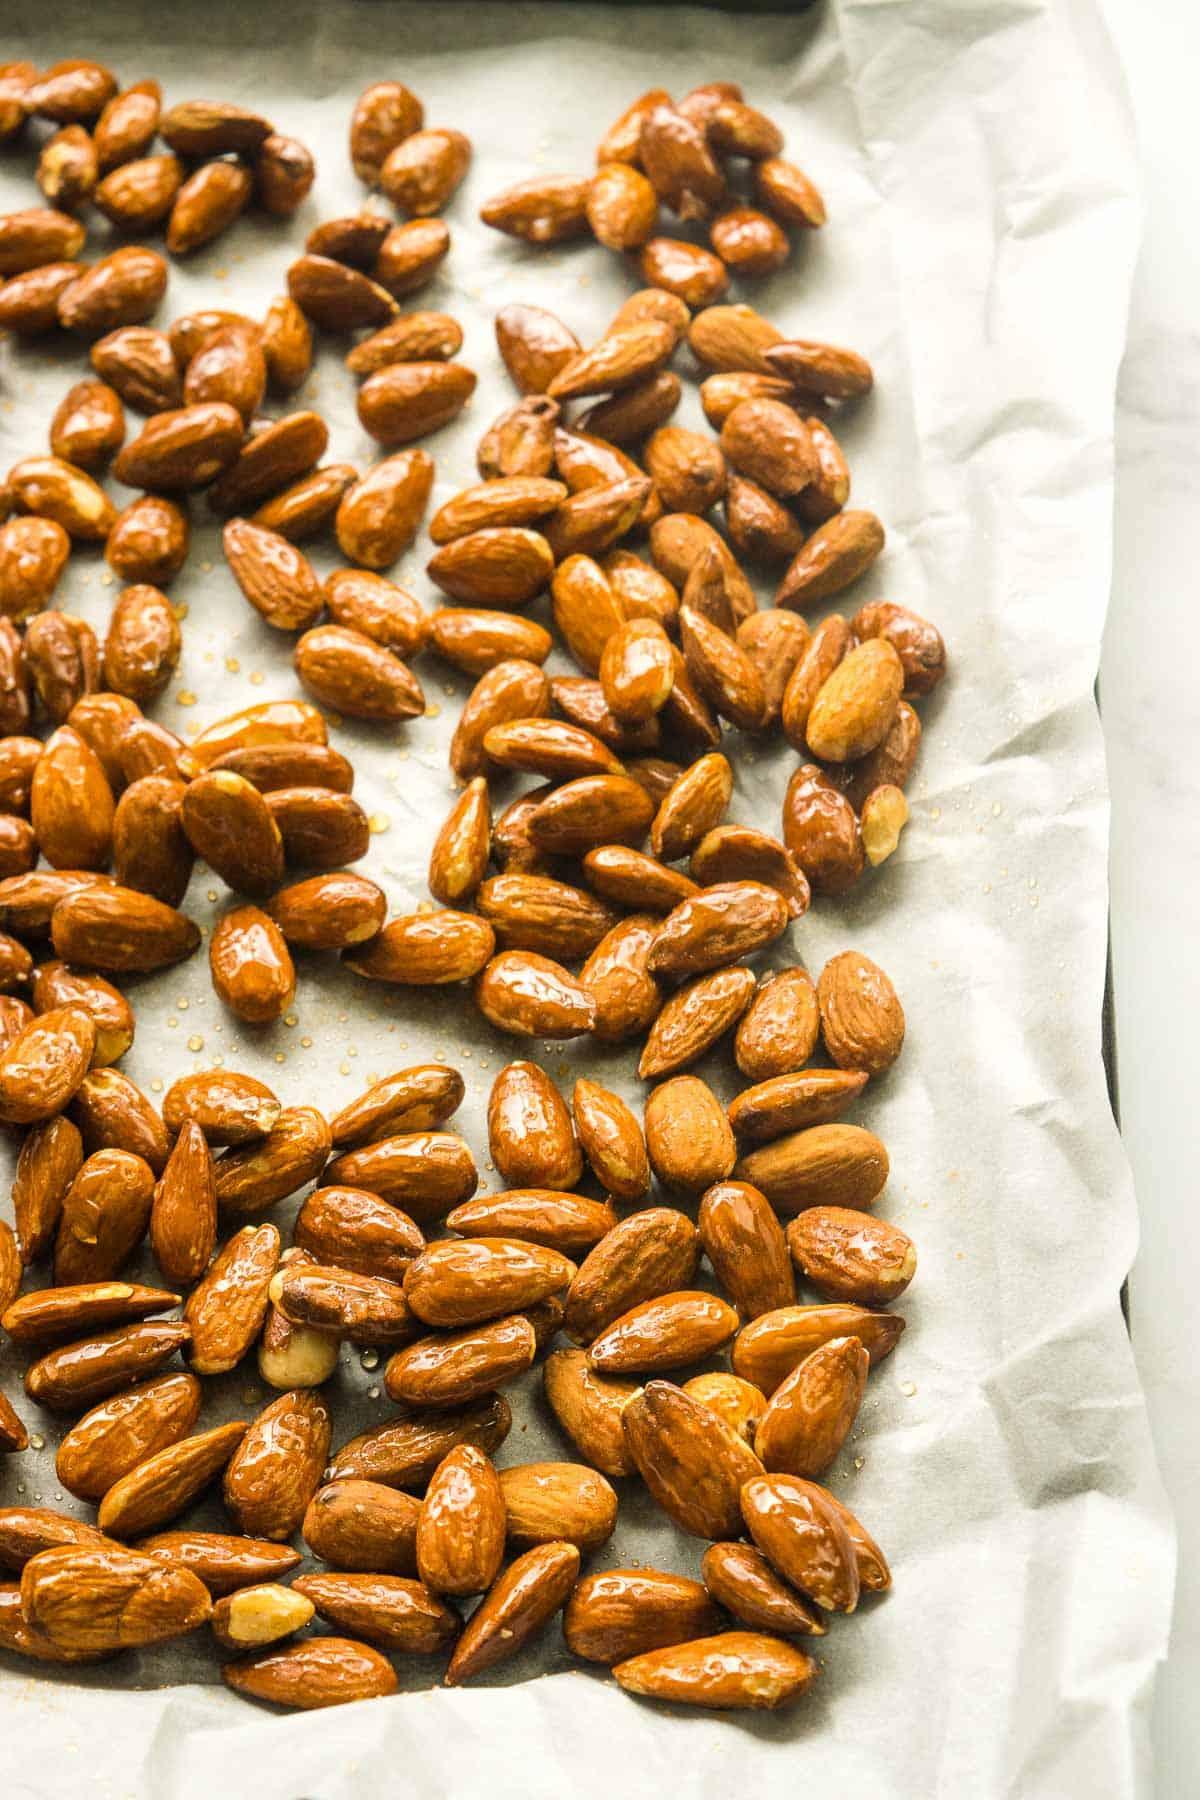 Honeyed almonds on a baking sheet.